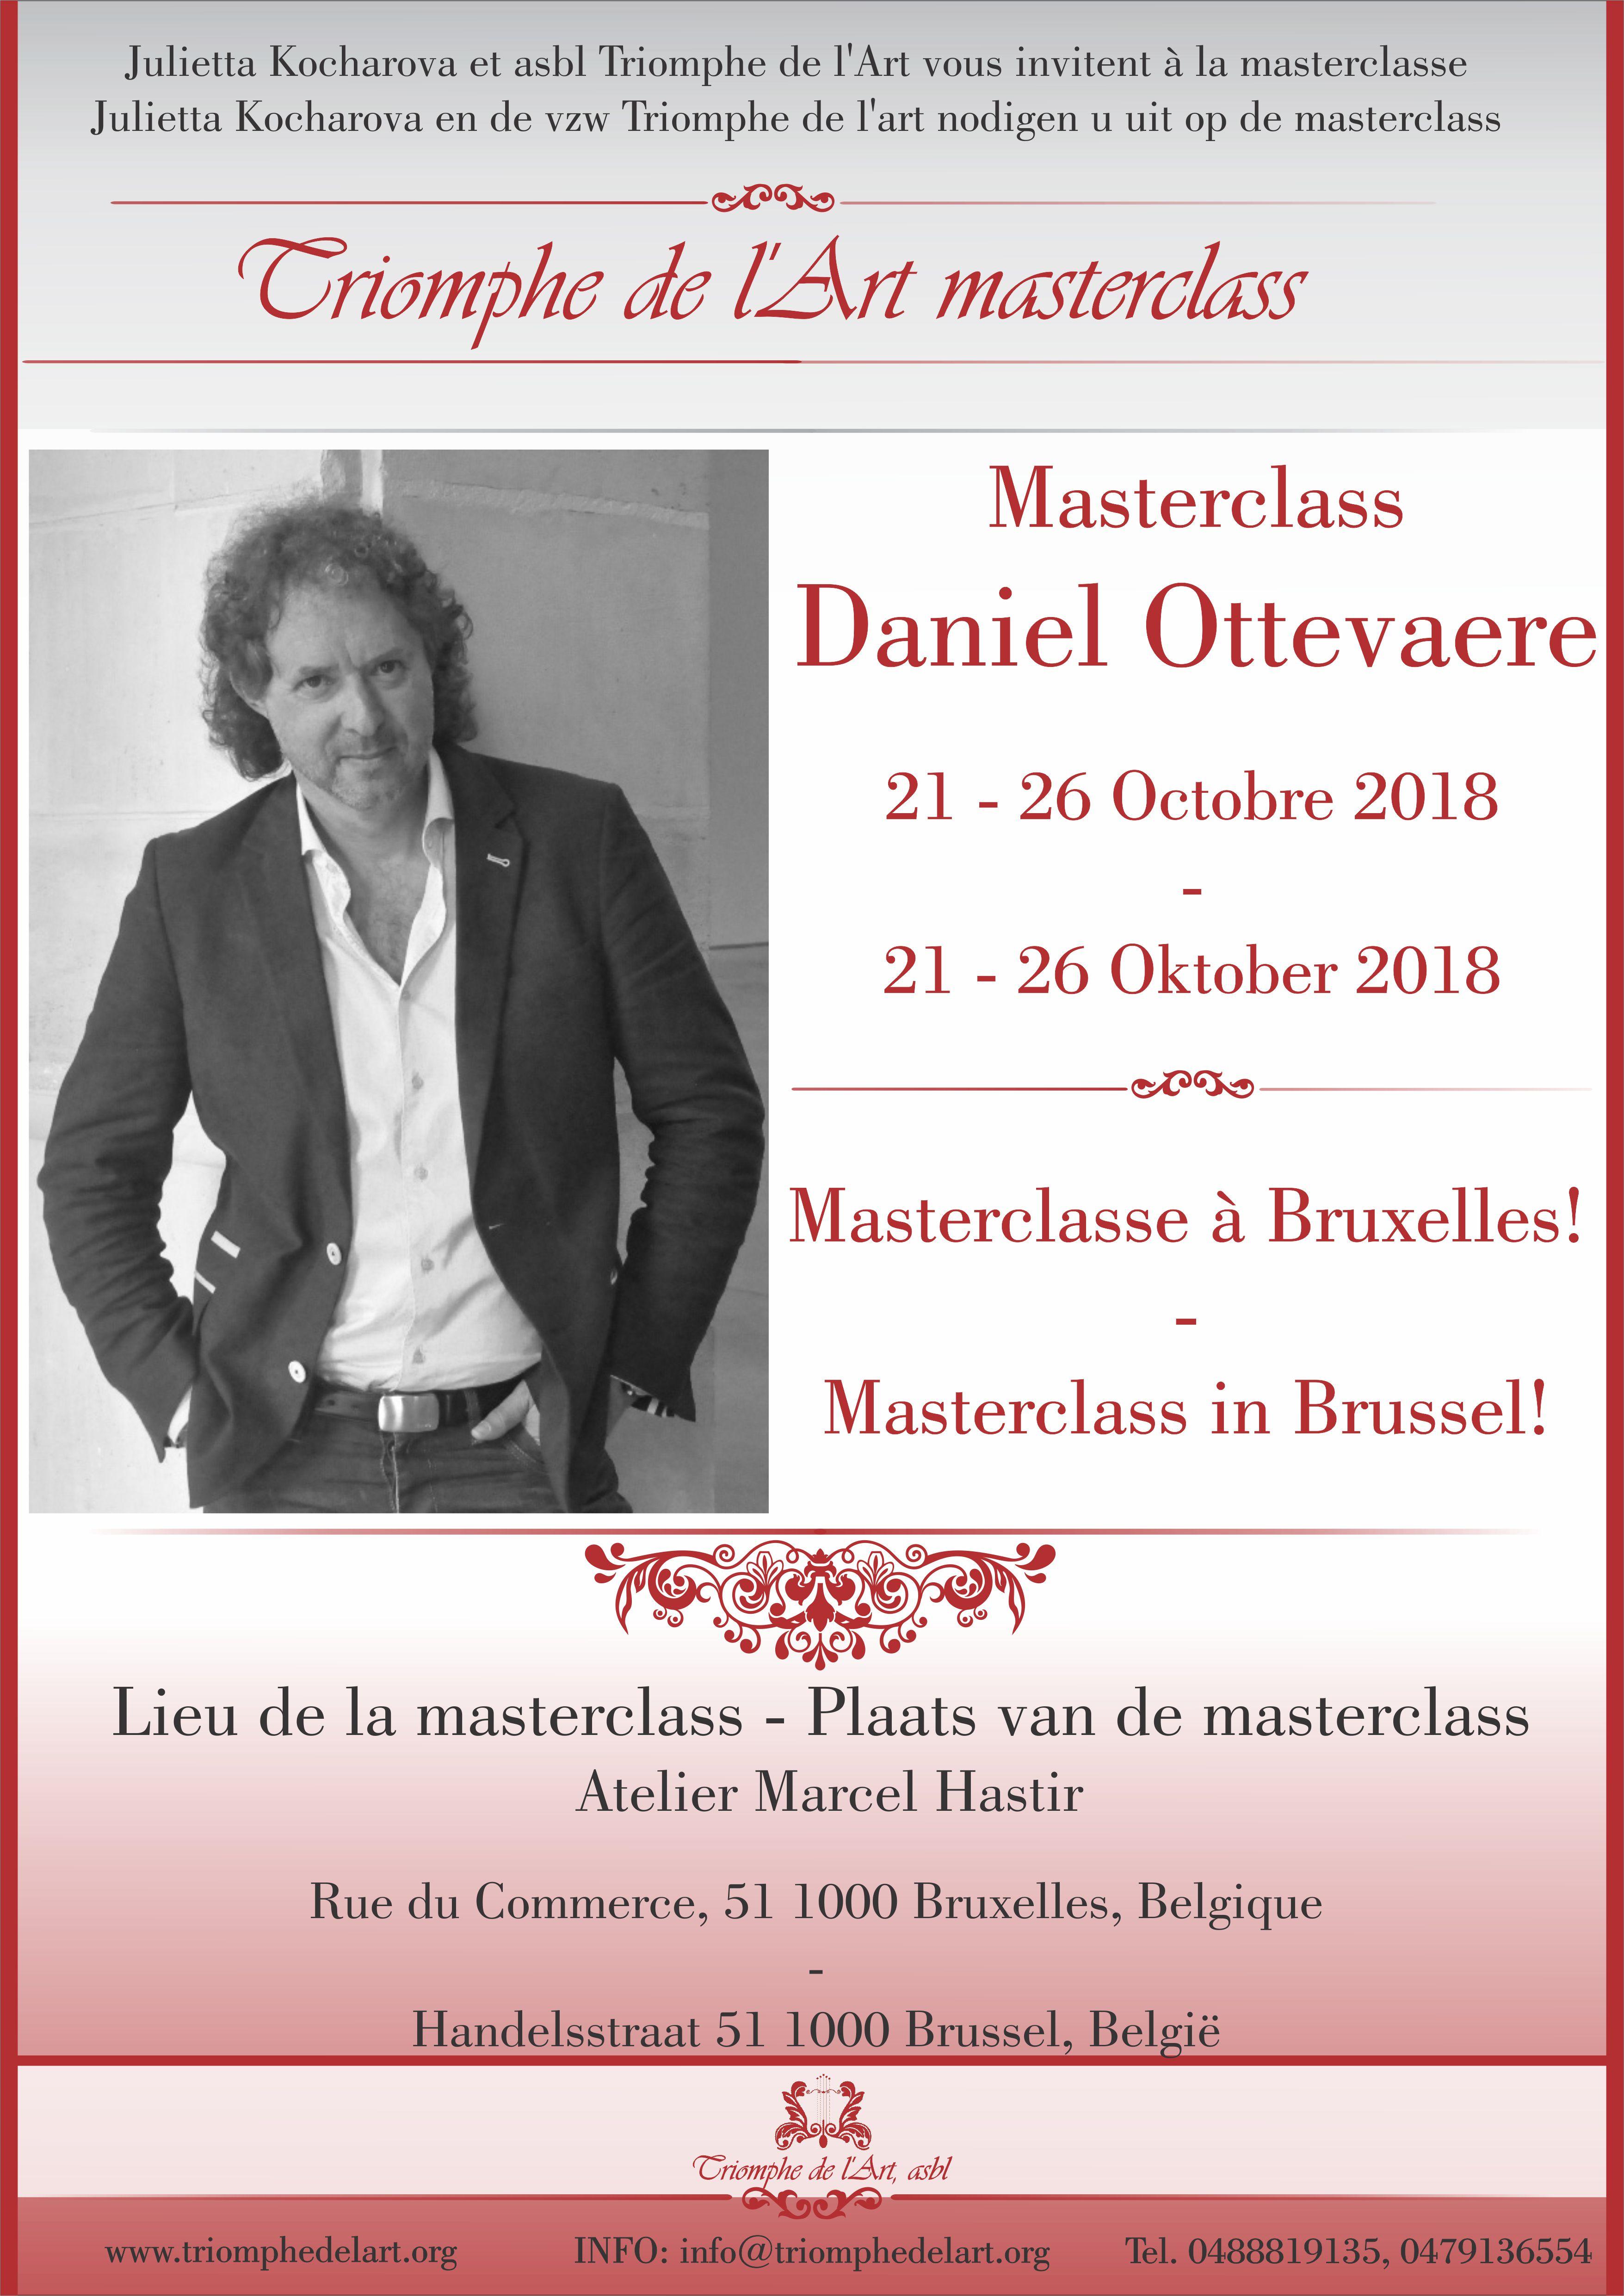 daniel ottevaere masterclasse 2018